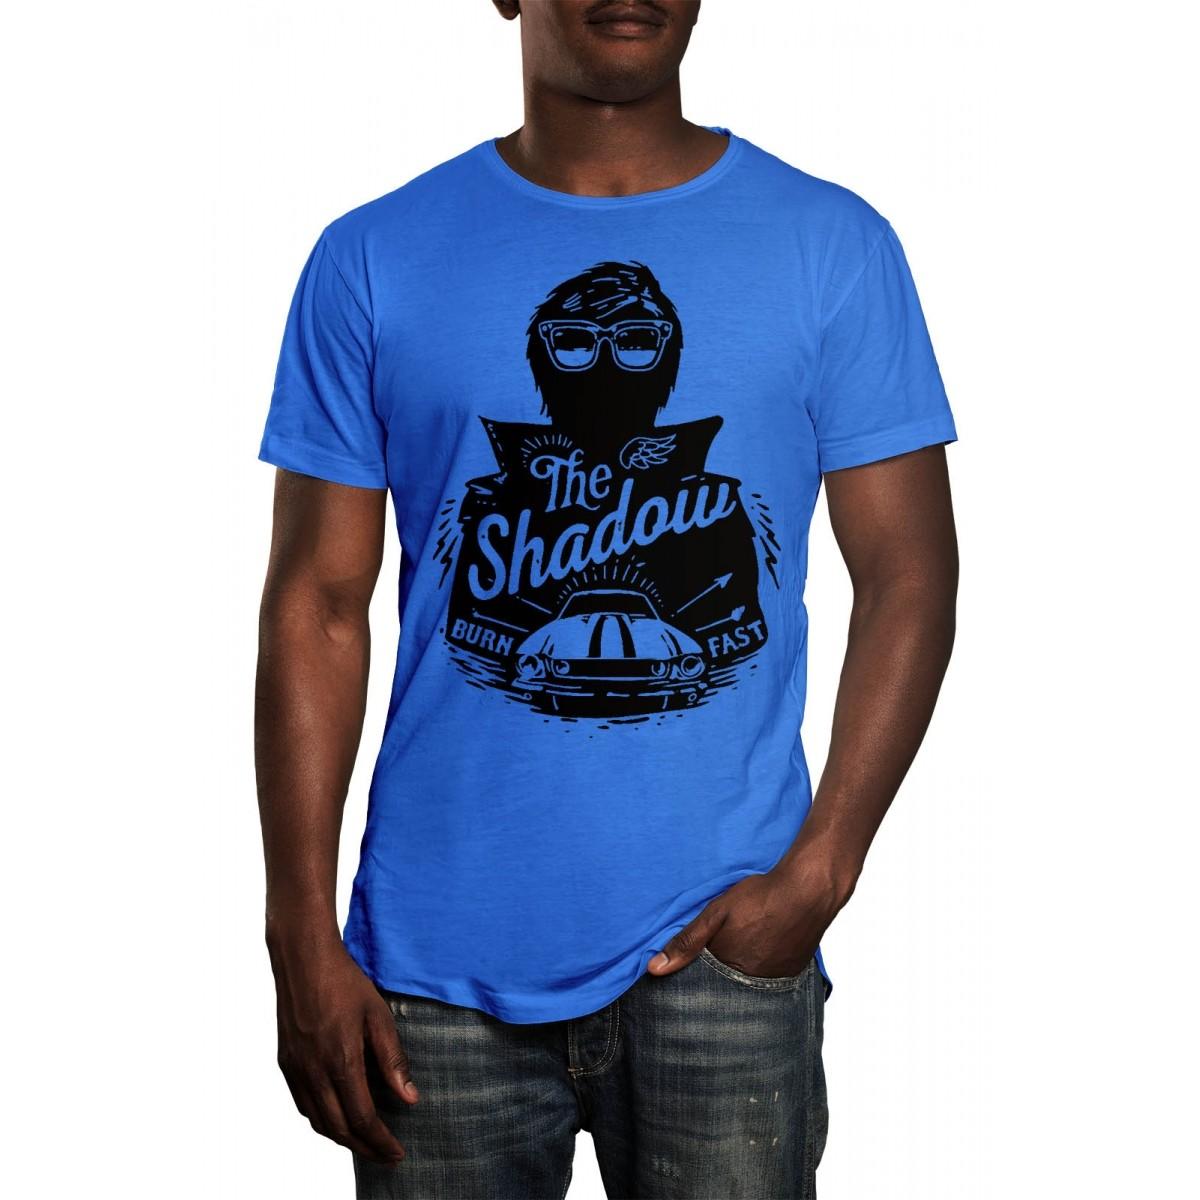 Camiseta HShop Burn  Fast Azul  - HShop